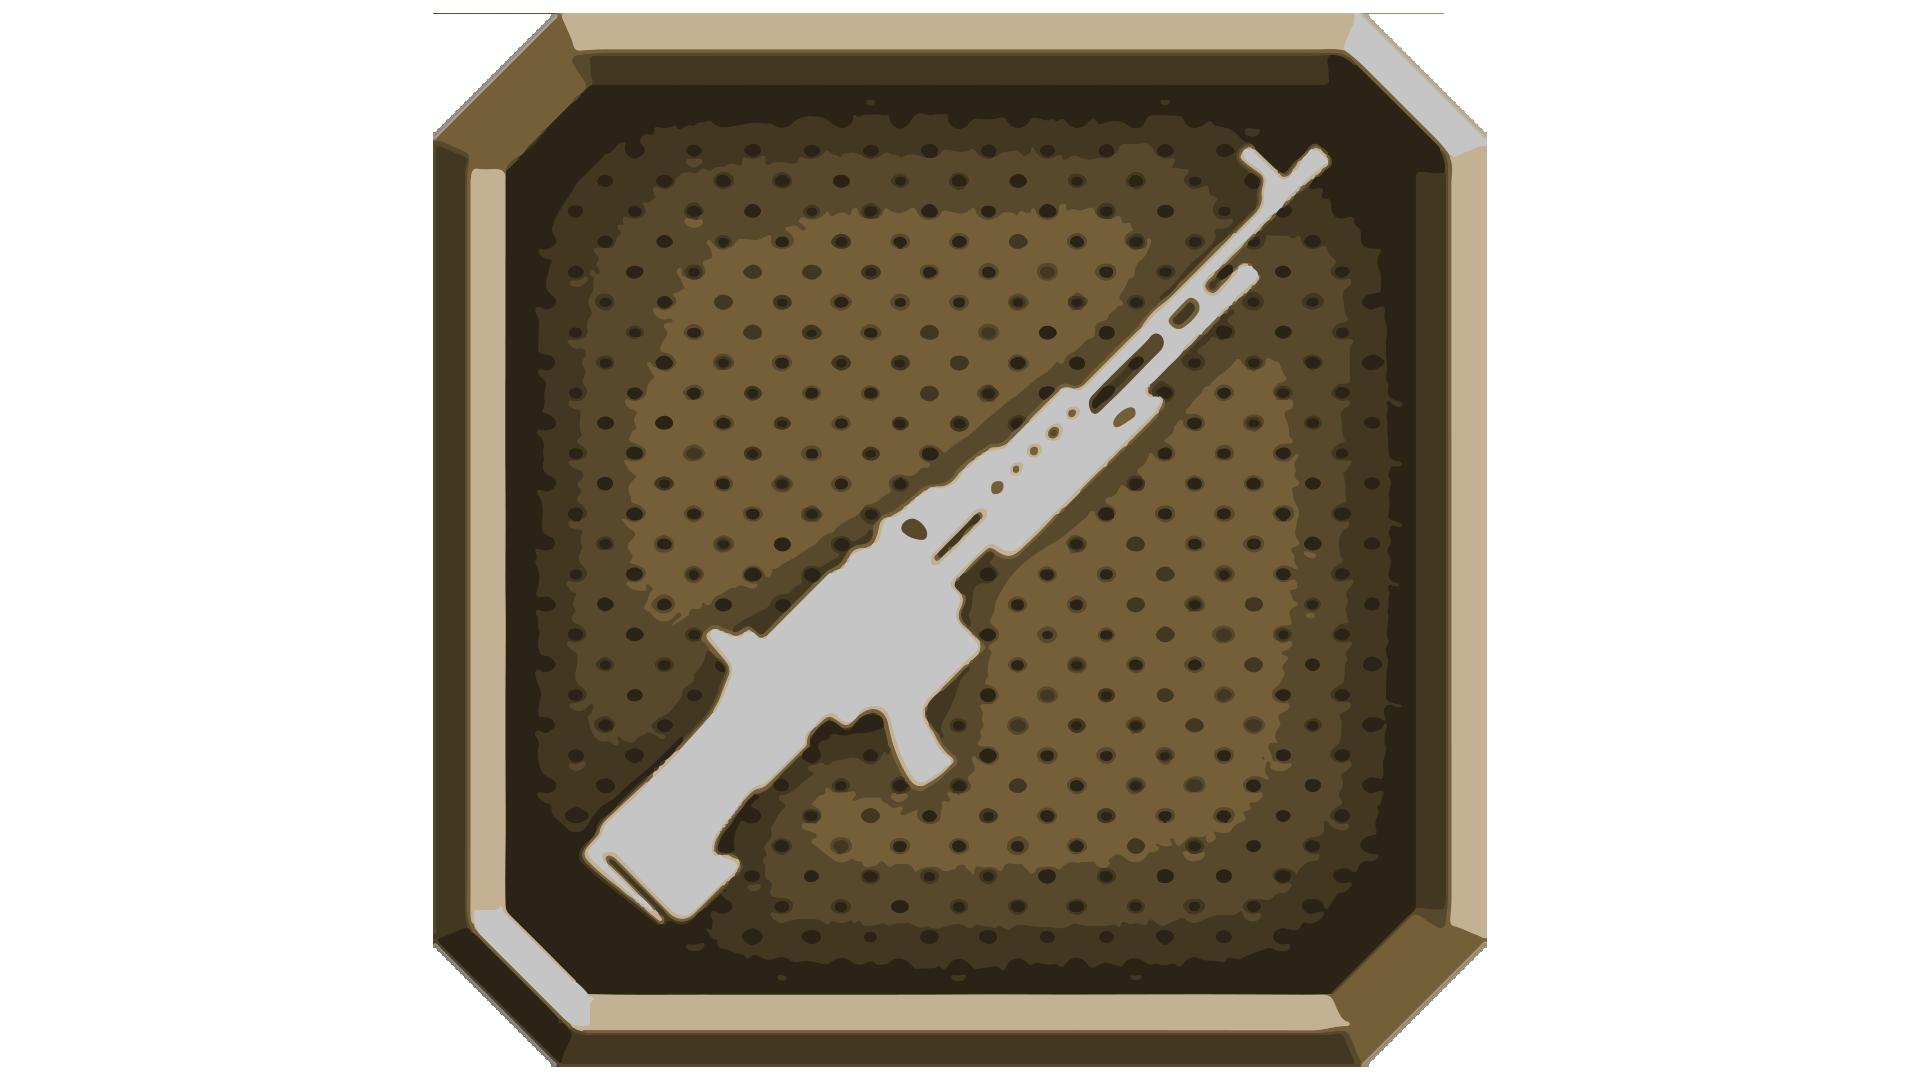 M60 Slayer achievement for Dead Alliance on Xbox One